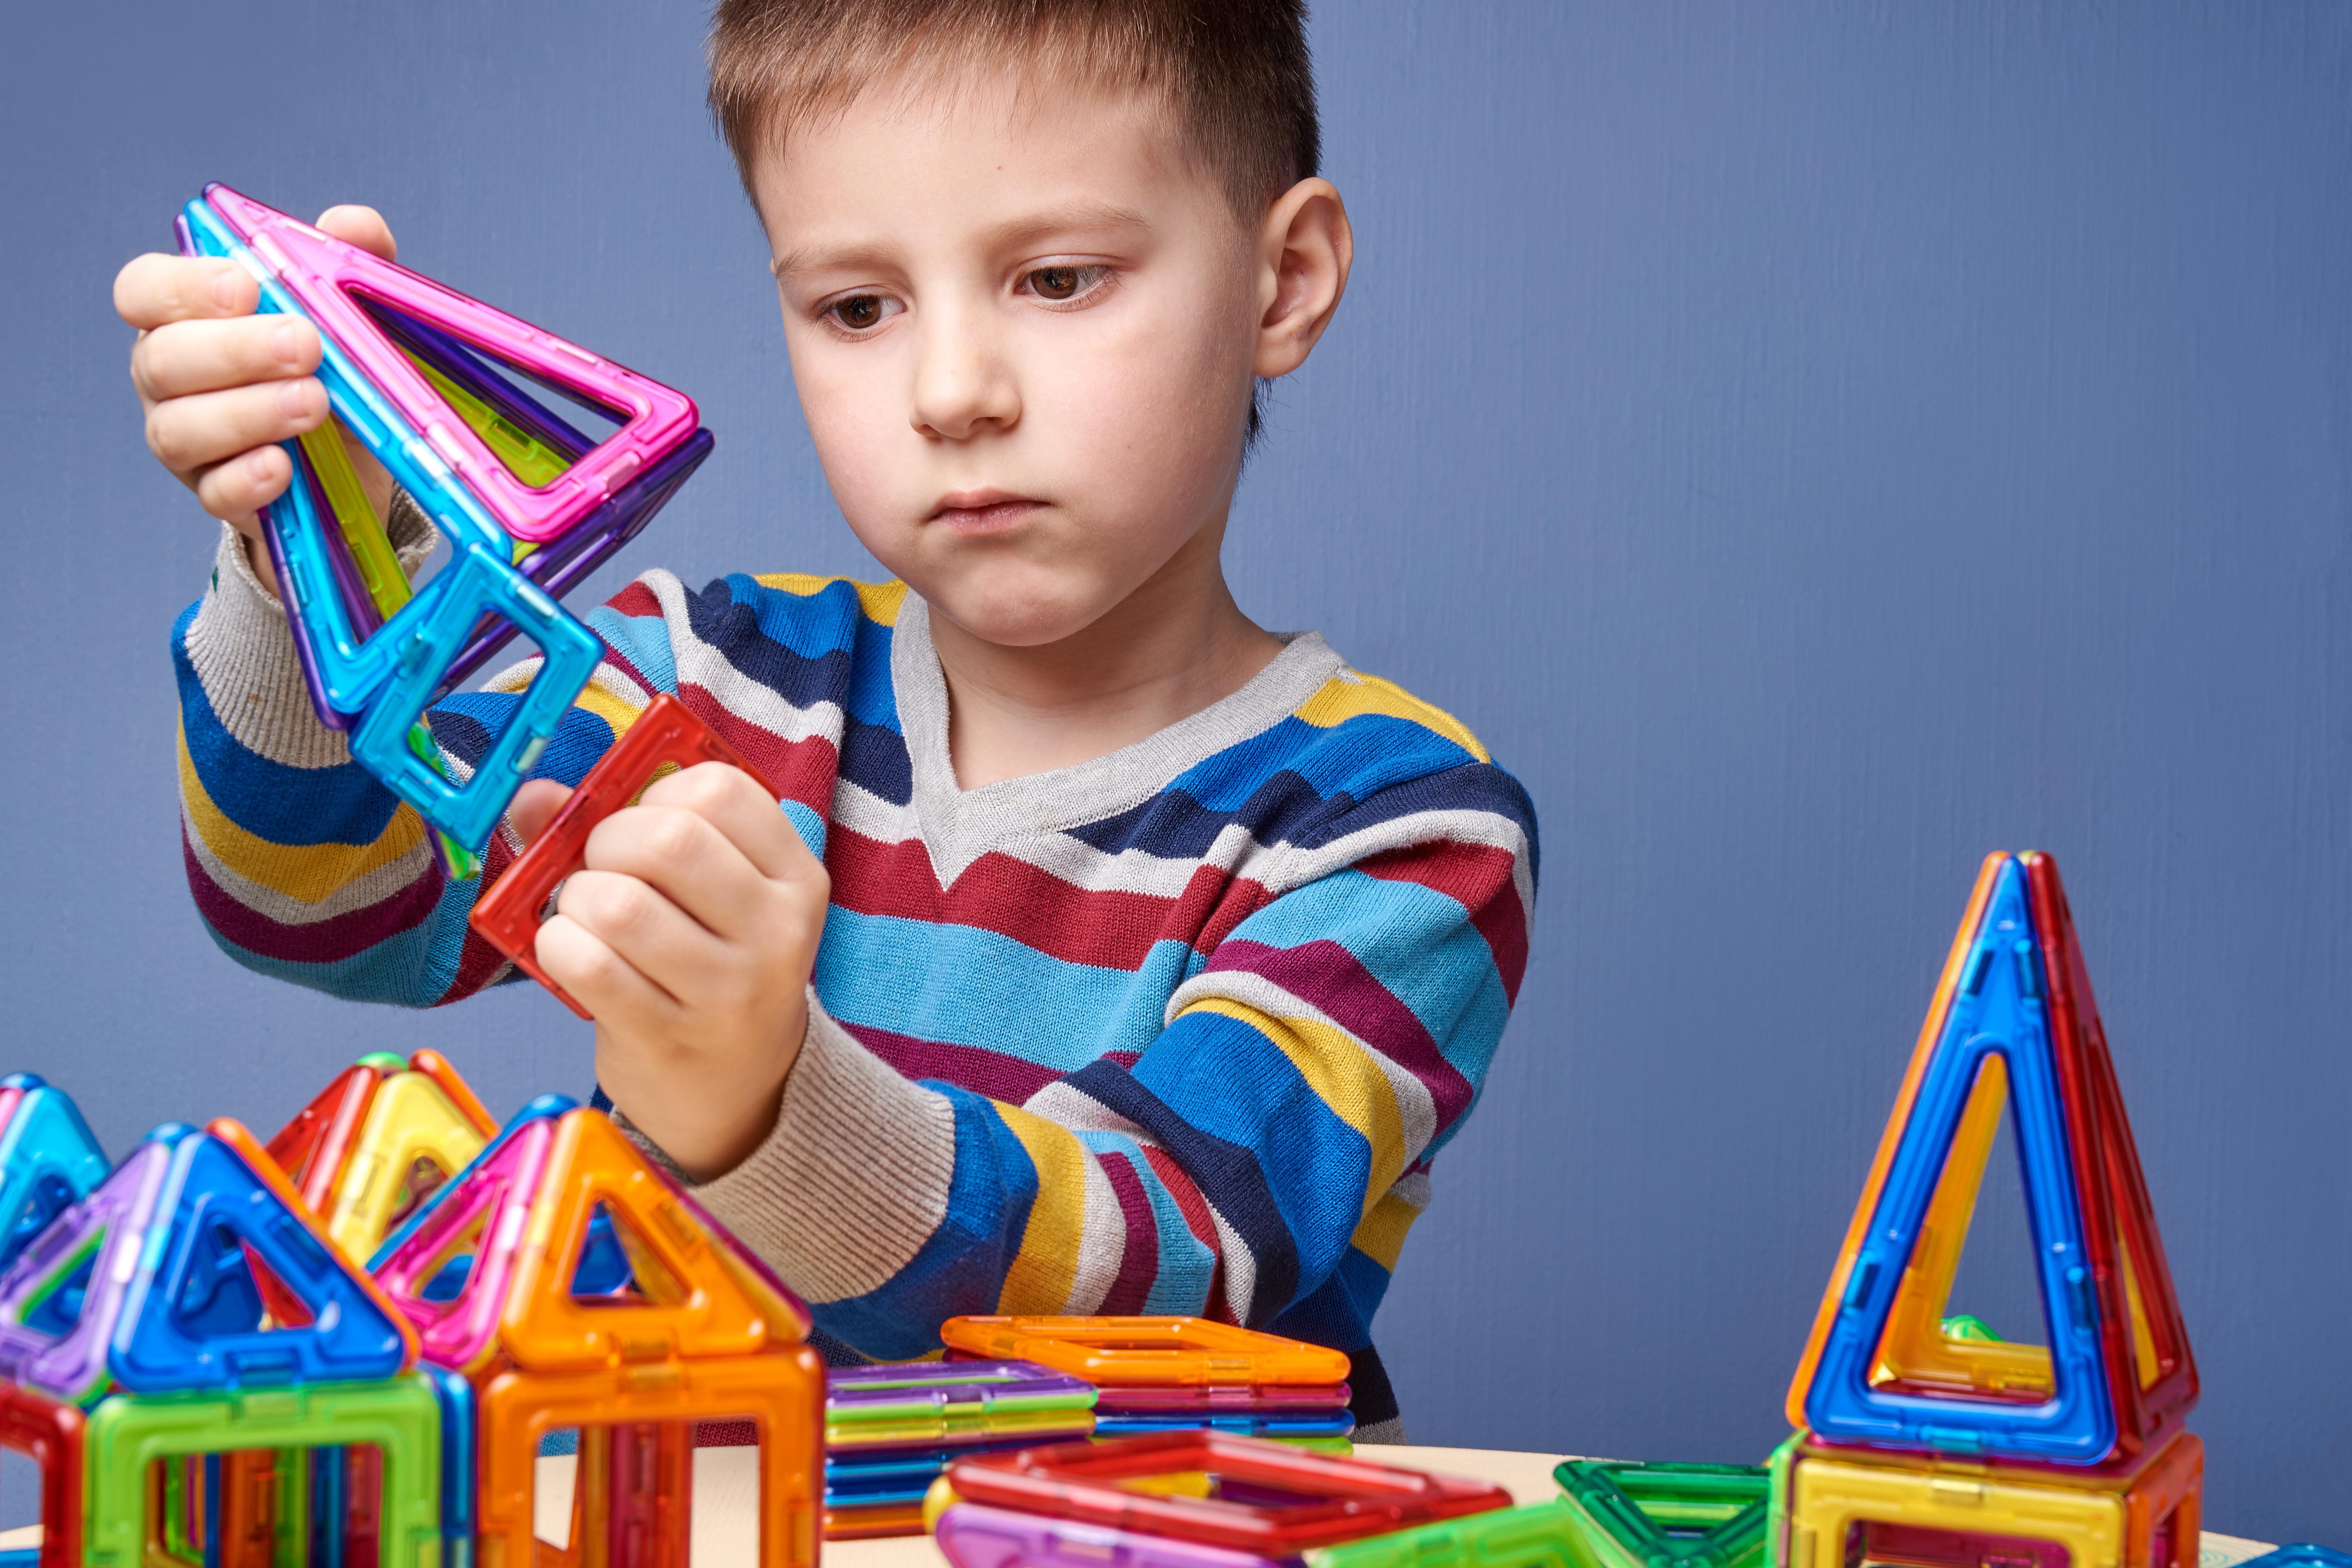 Bailey Bridge Physics Science Education Toy Kids Intelligence Development